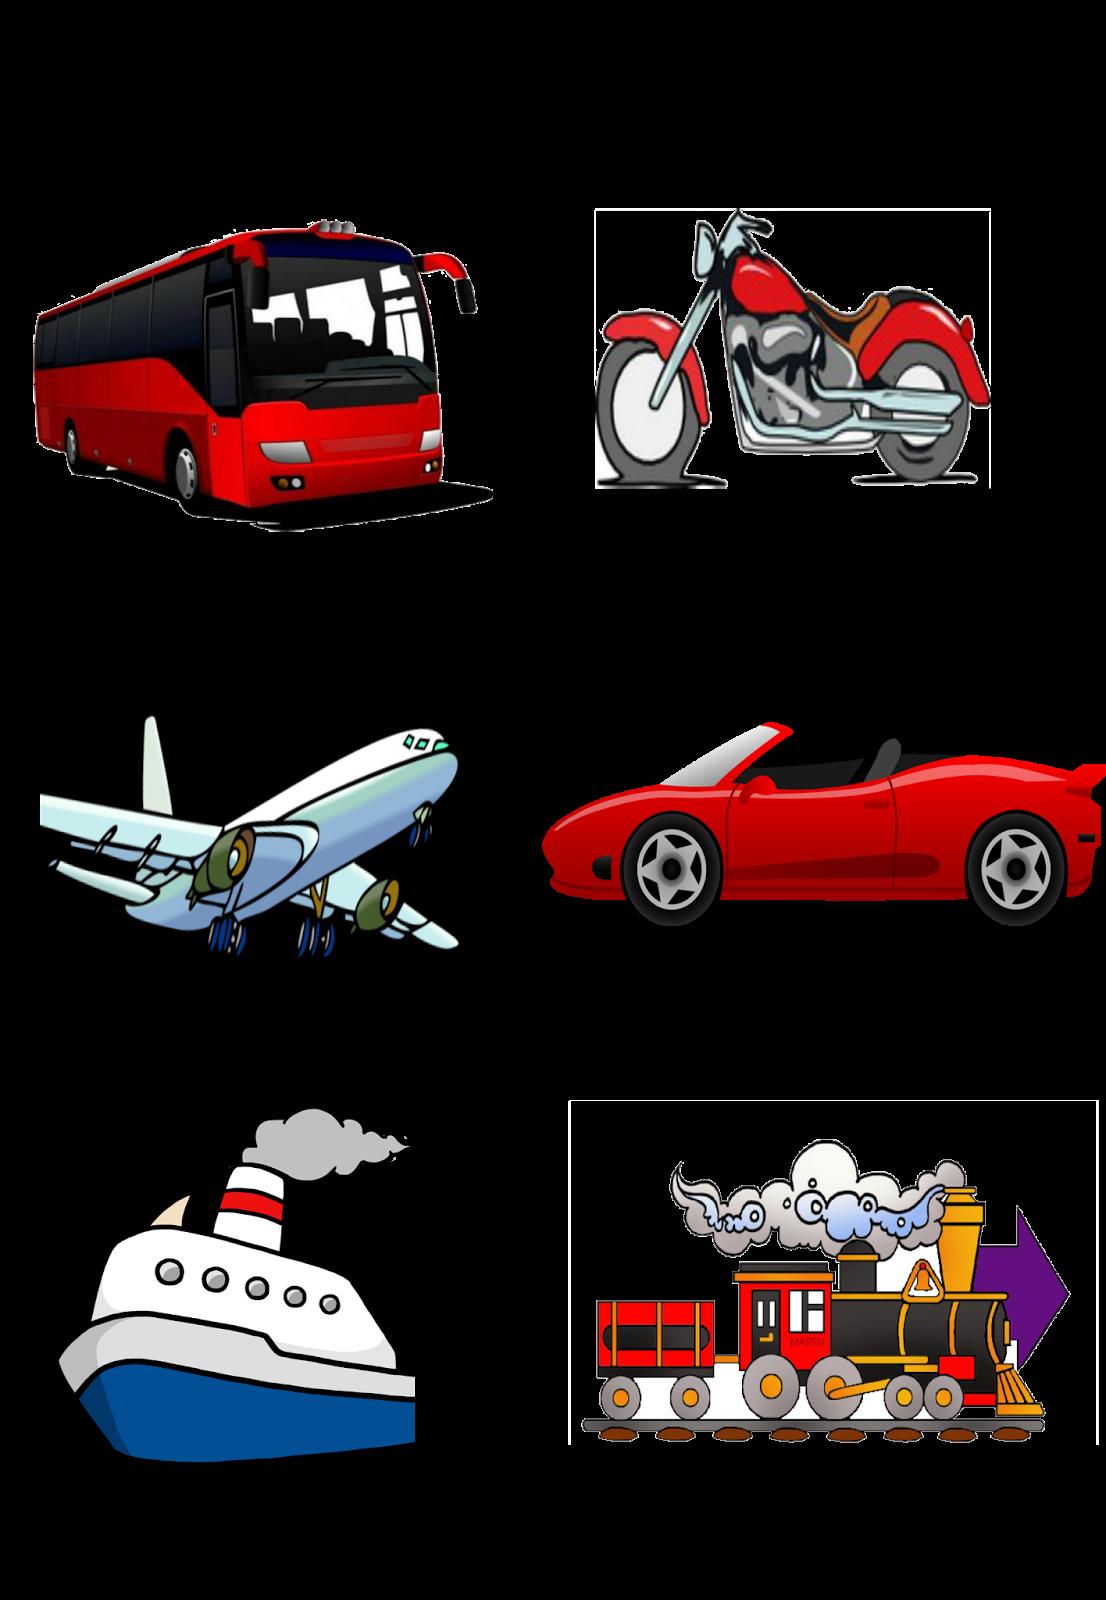 Transportation clipart bingo, Transportation bingo